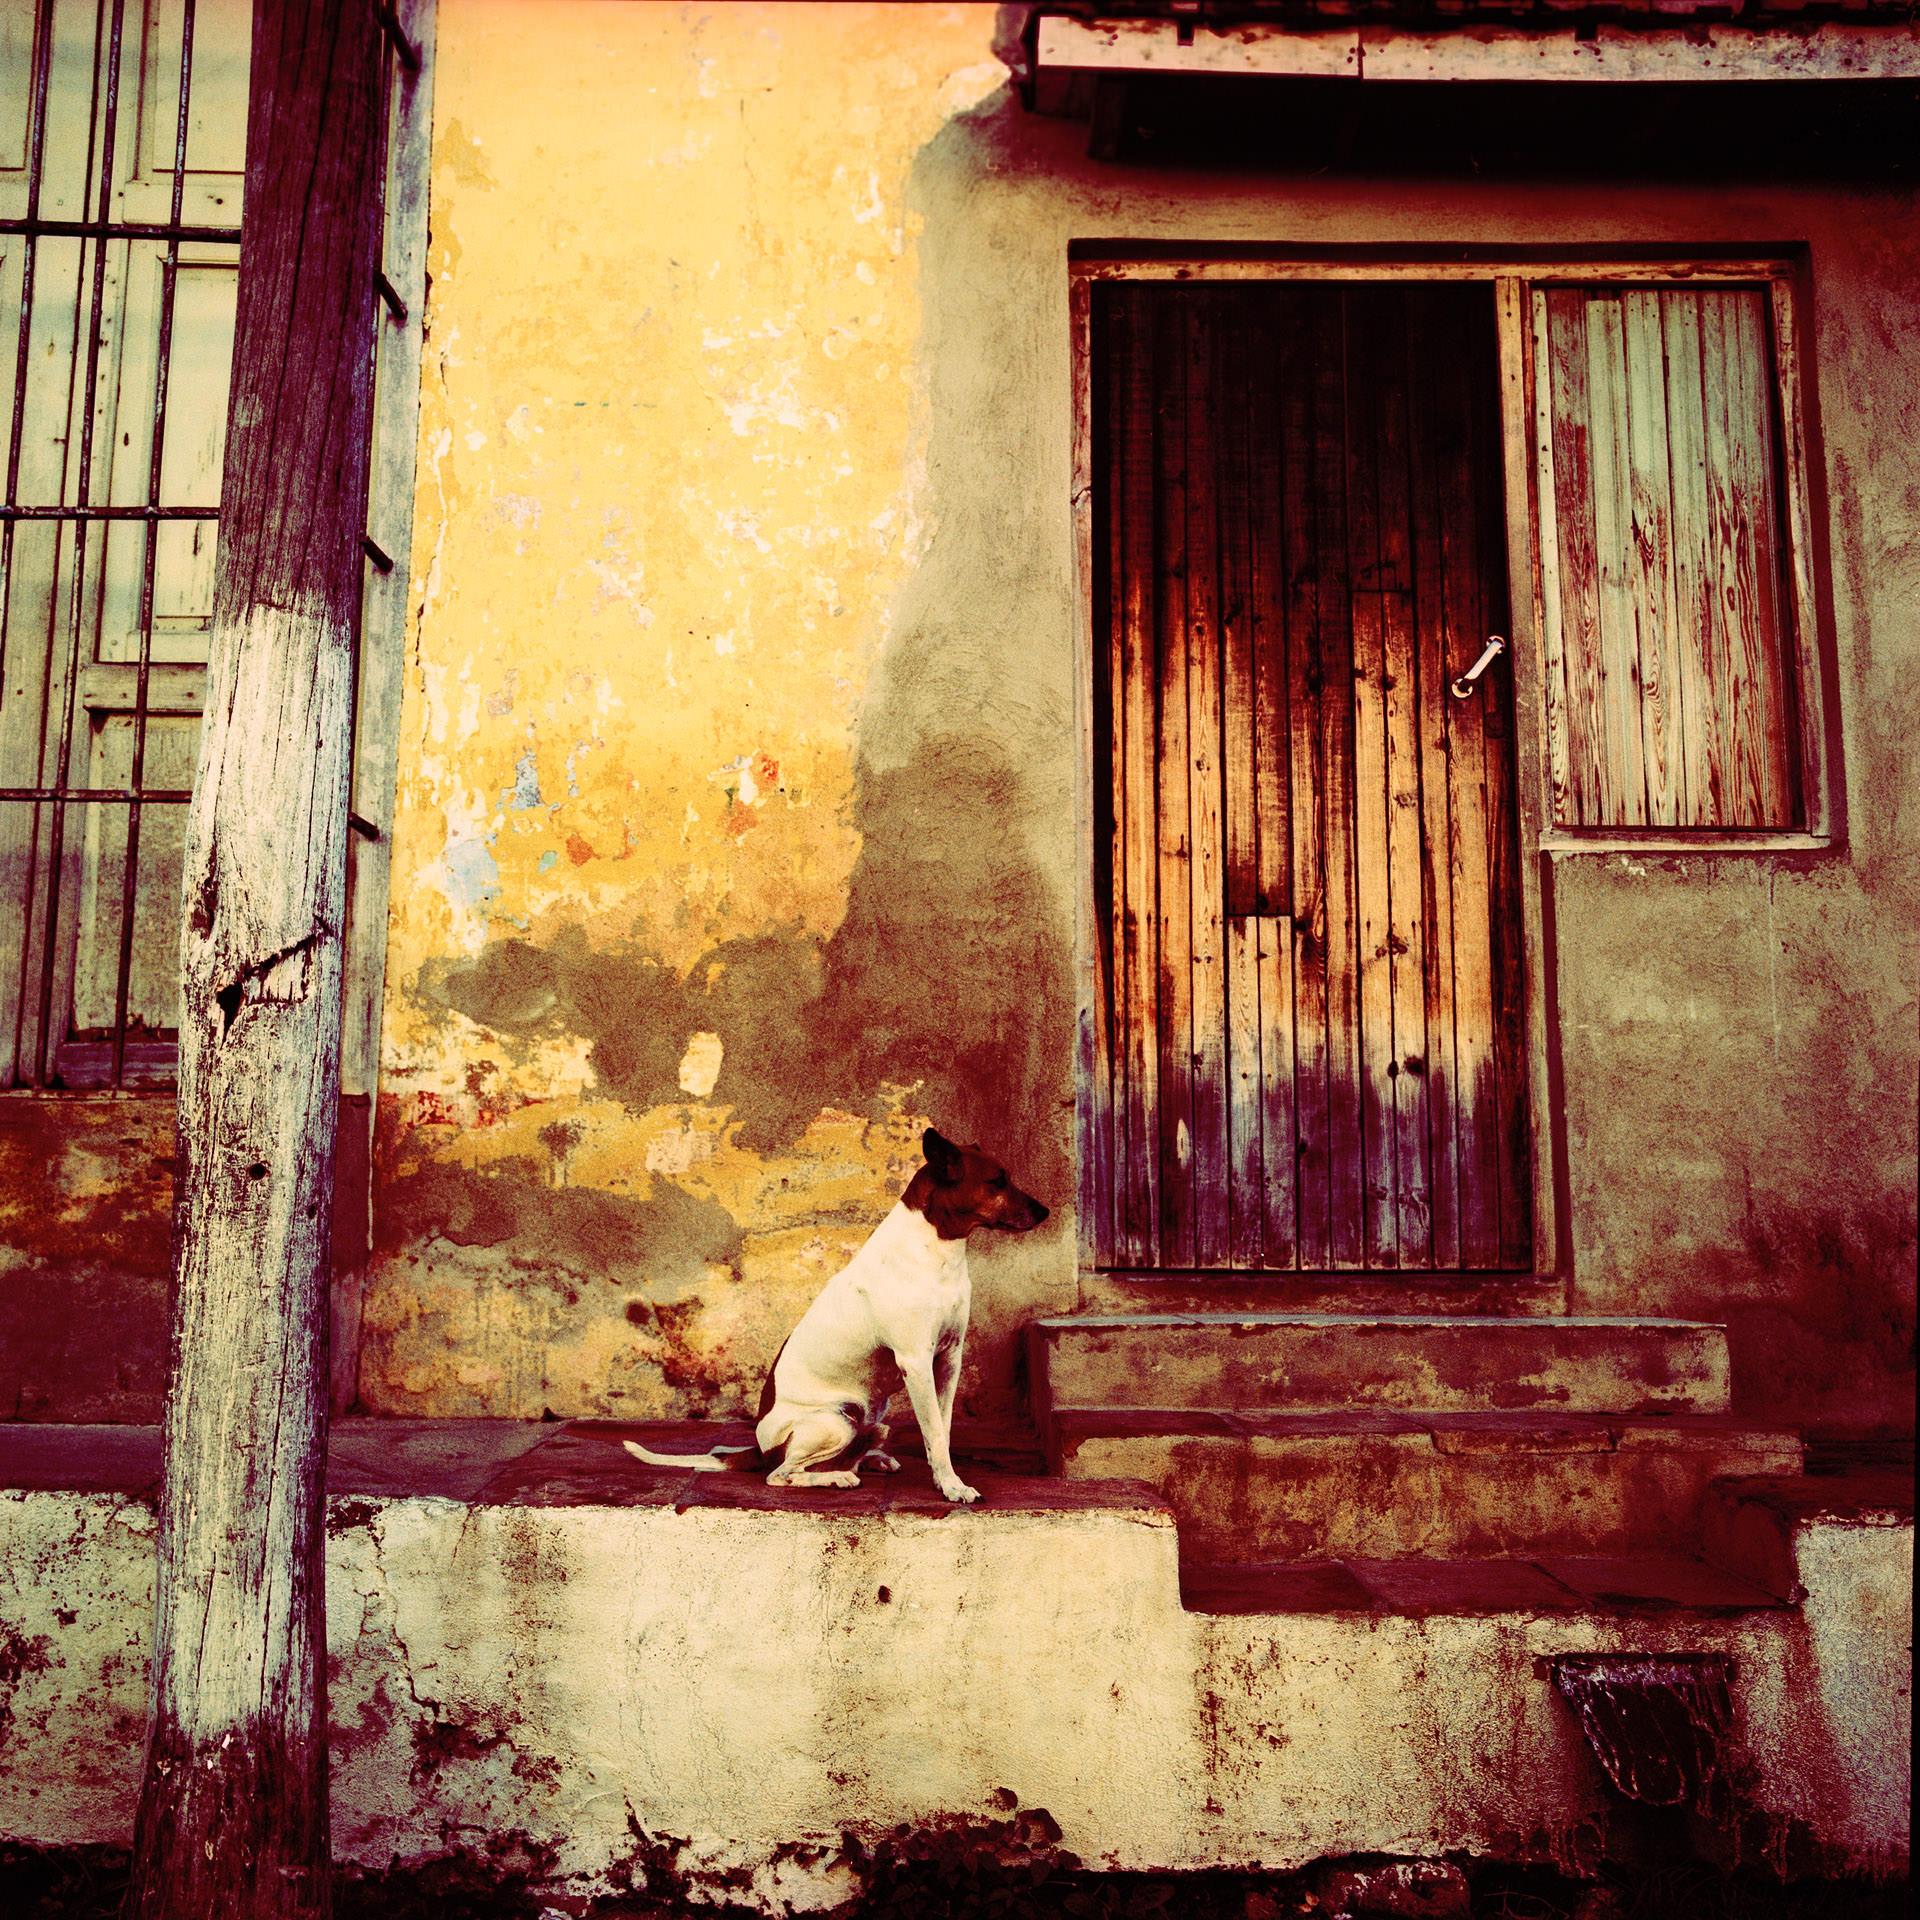 6.Trinidad dog